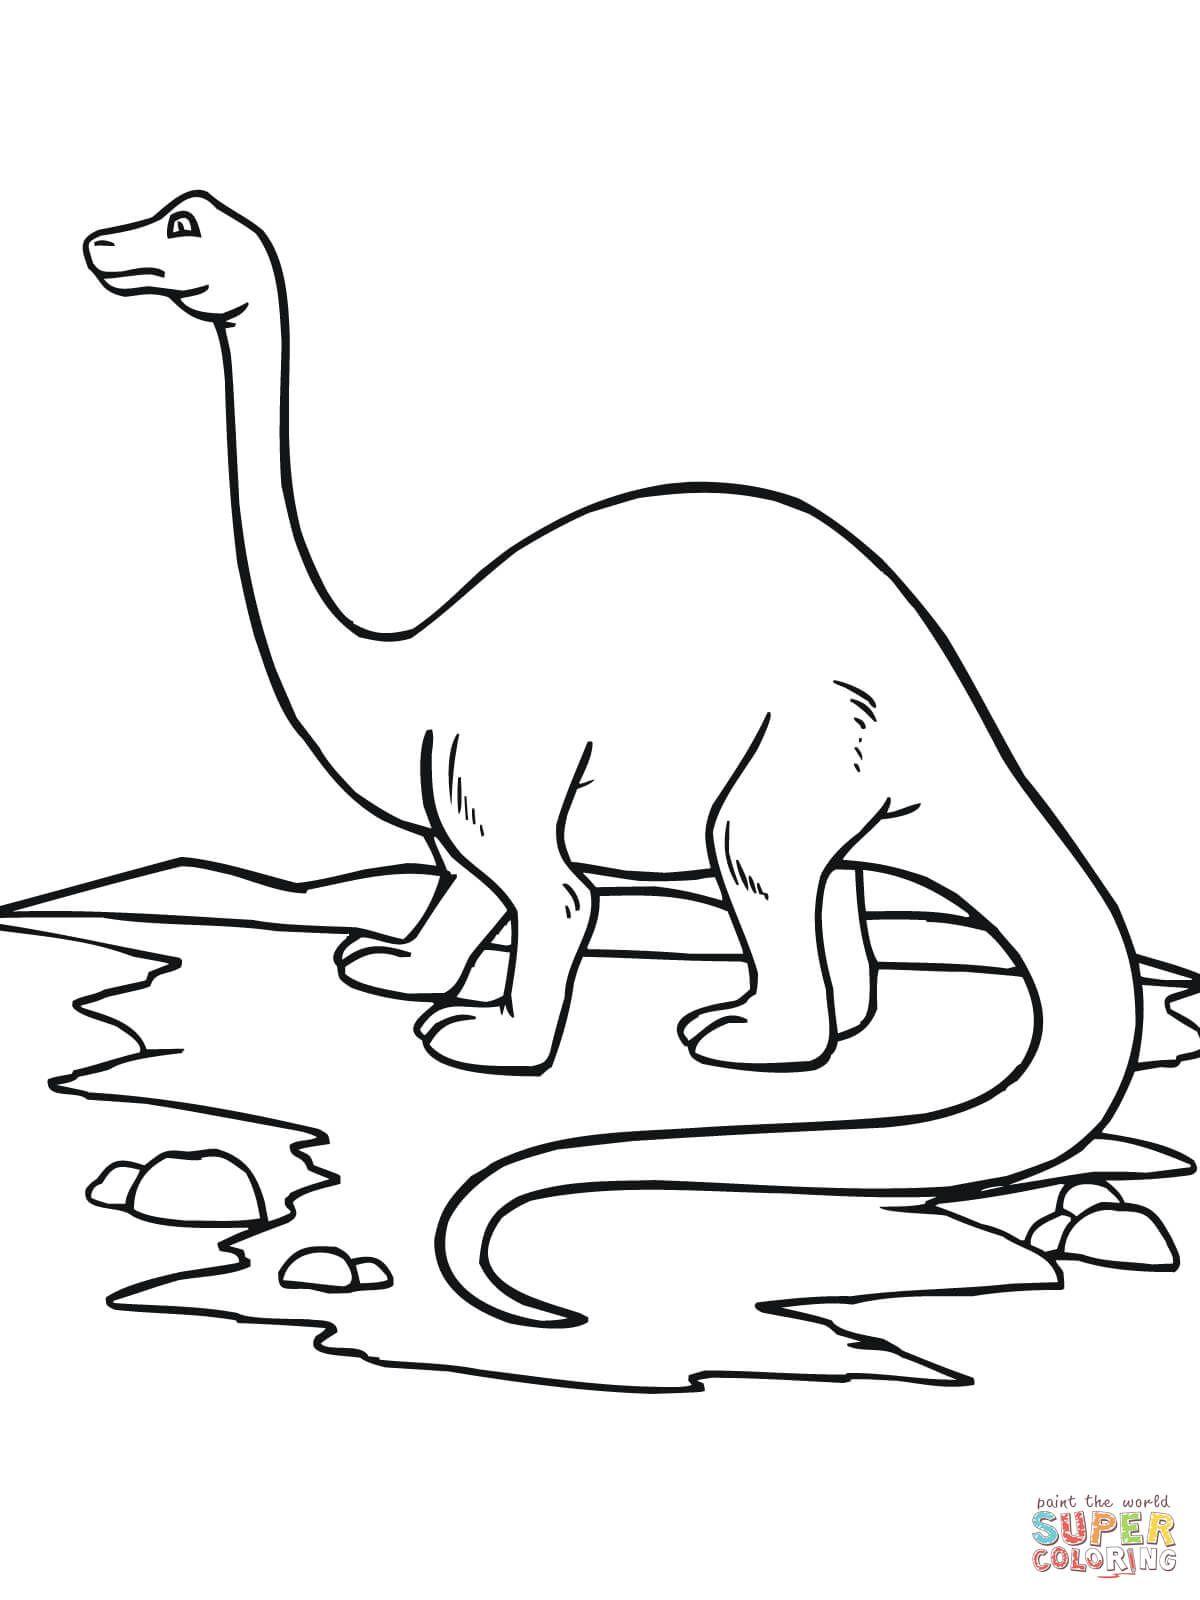 Brontosaurus Dinosaur Coloring Page Creative Free Coloring Pages